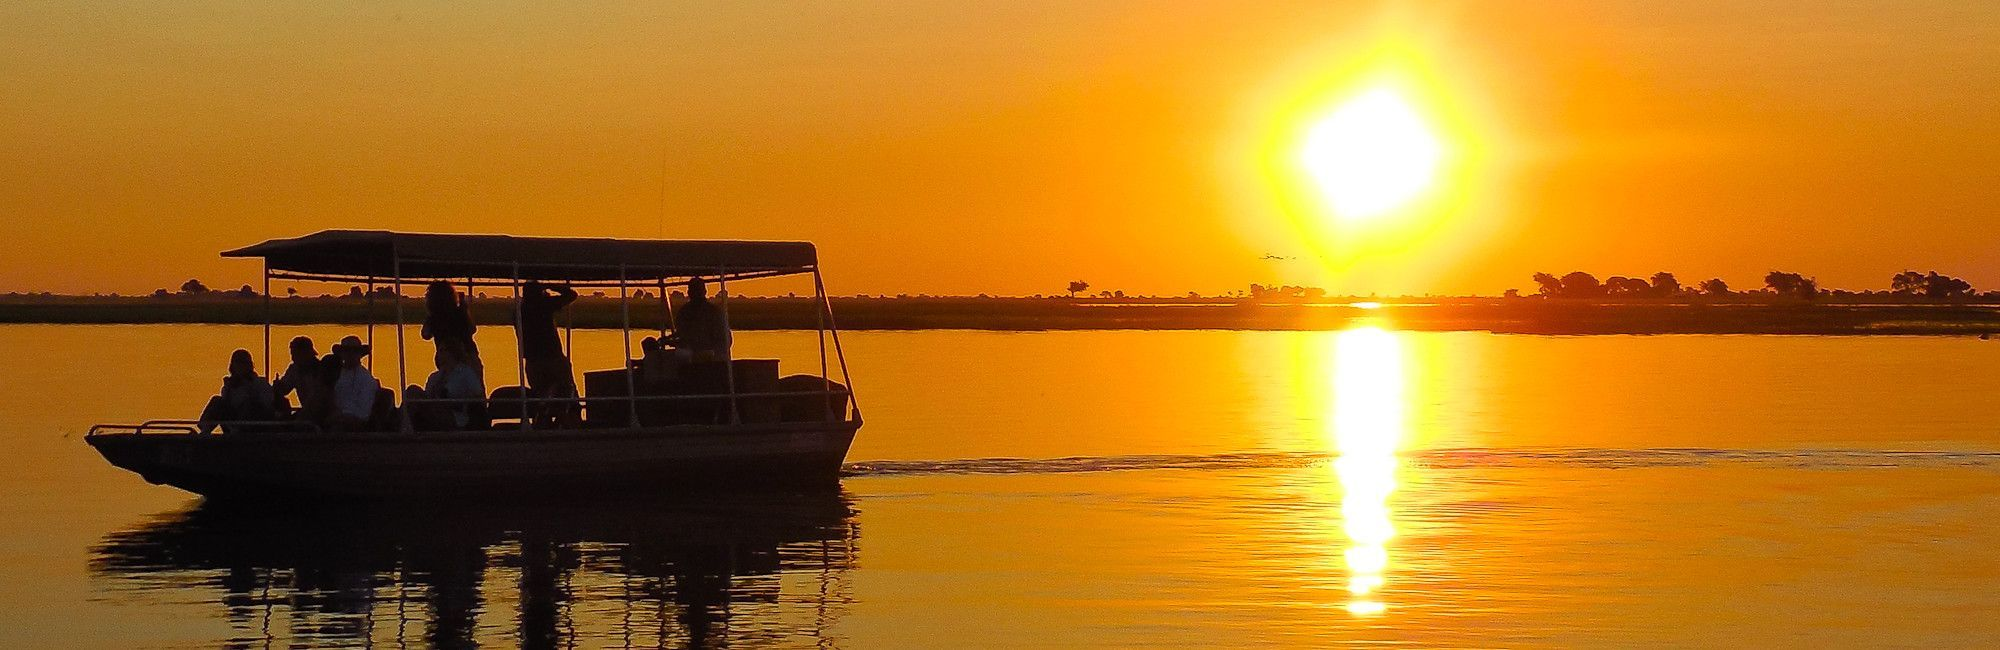 Luxe Groepsreis Botswana Namibië Zimbabwe